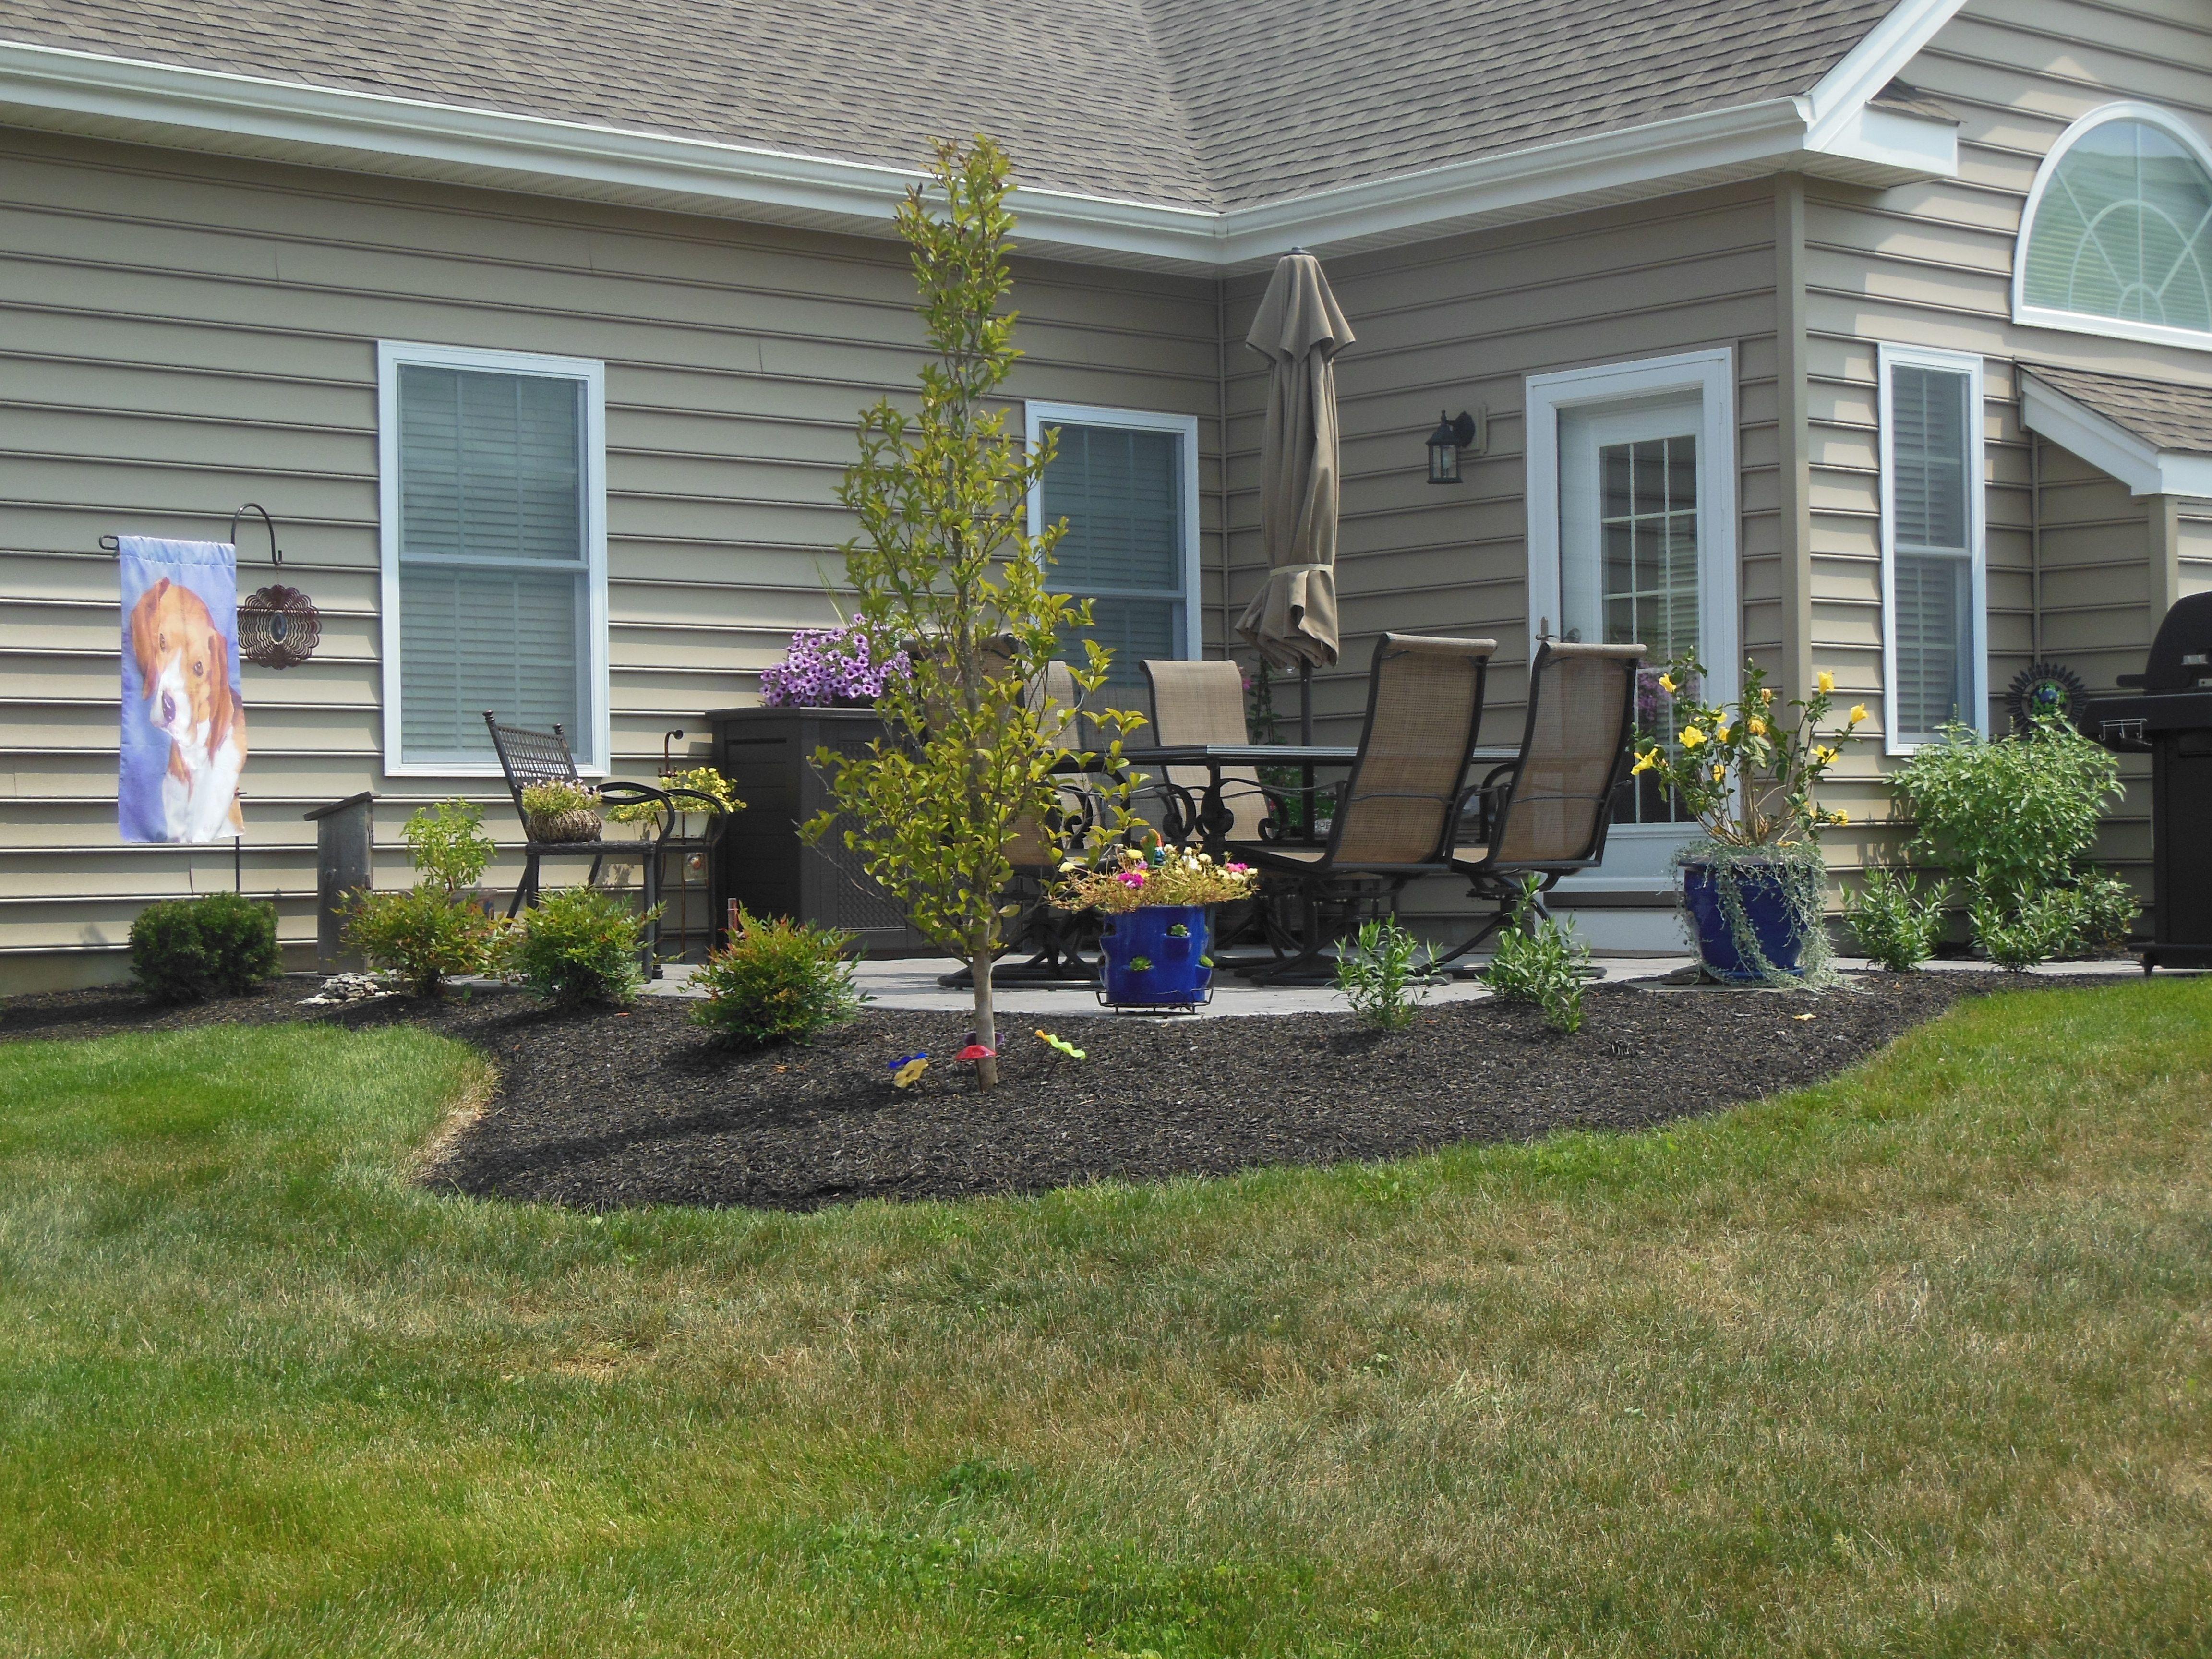 landscaping around patio ideas